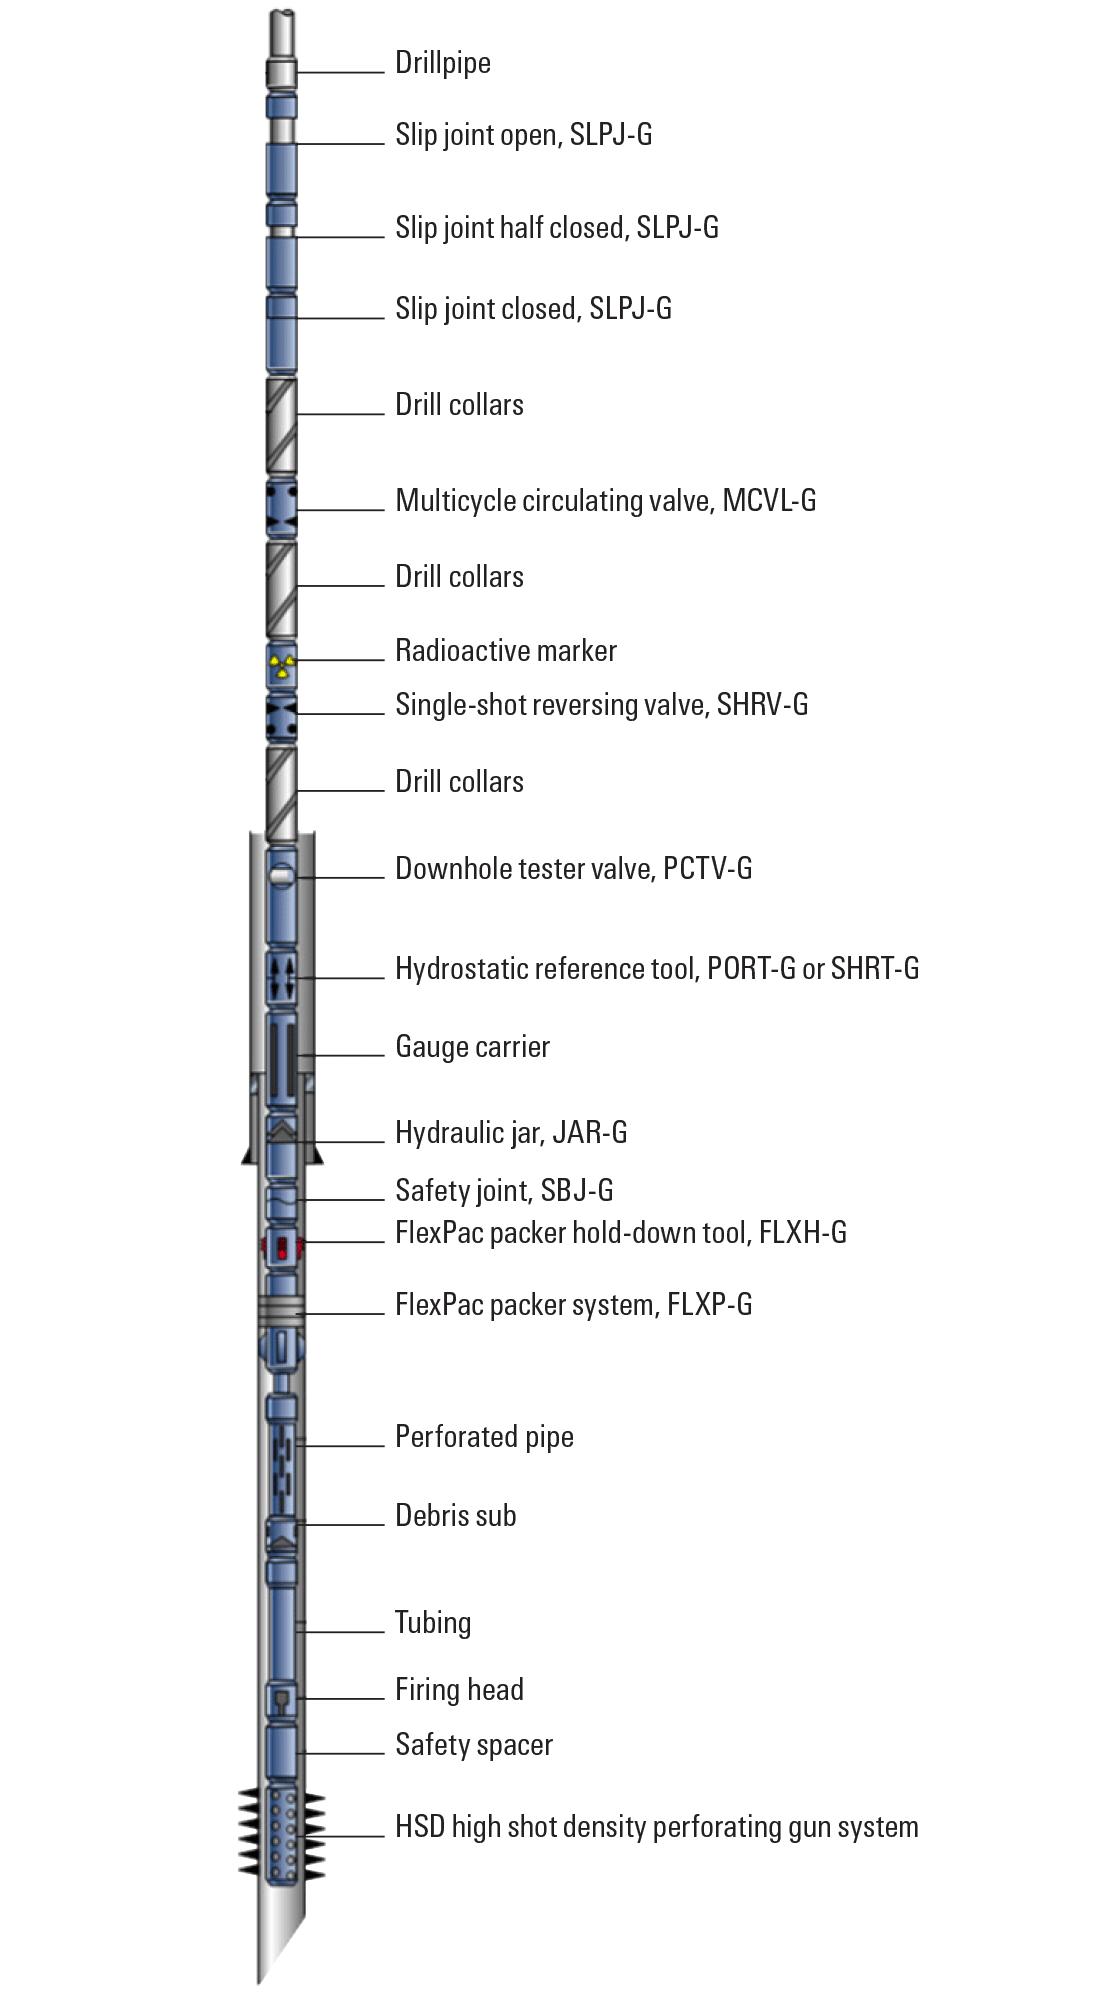 Slimhole drillstem testing string